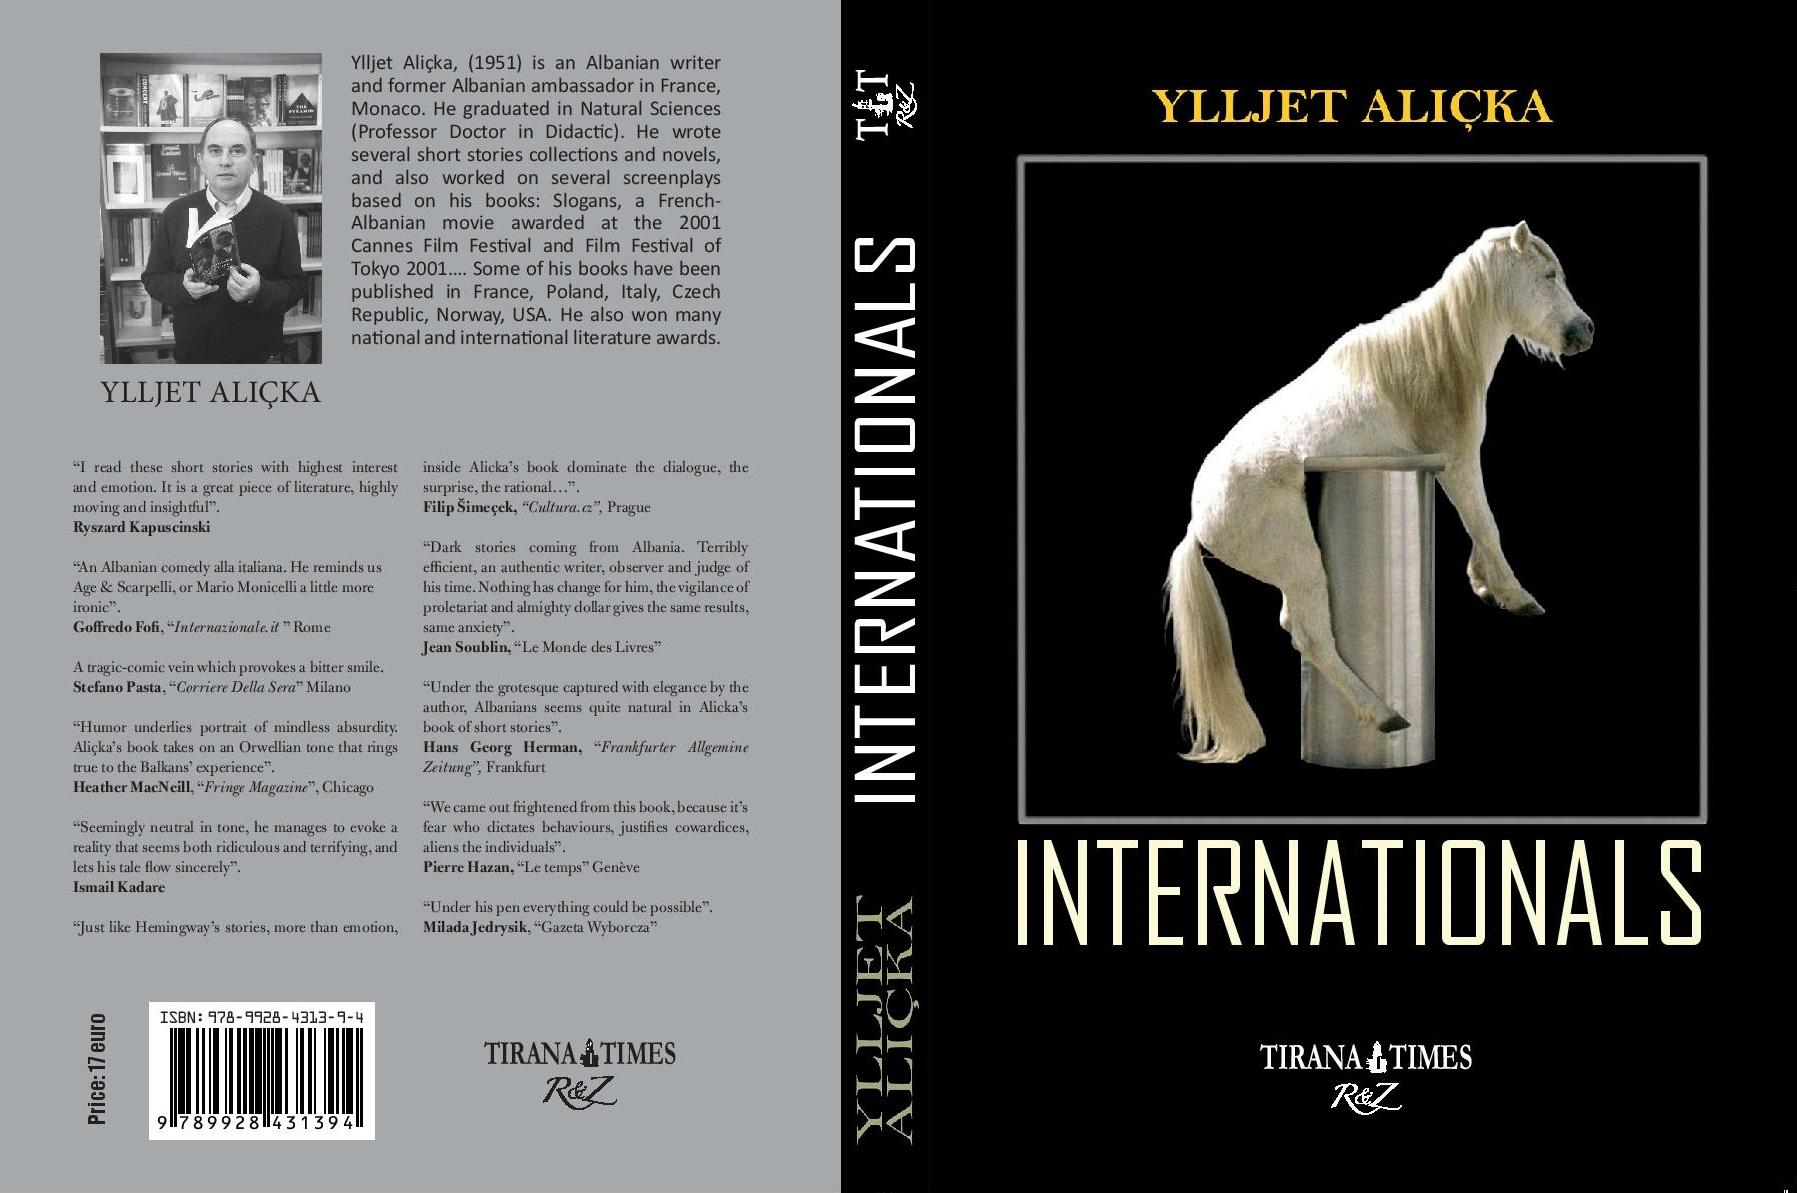 The Internationals: When 'elite' arrogance meets ignorance | Tirana